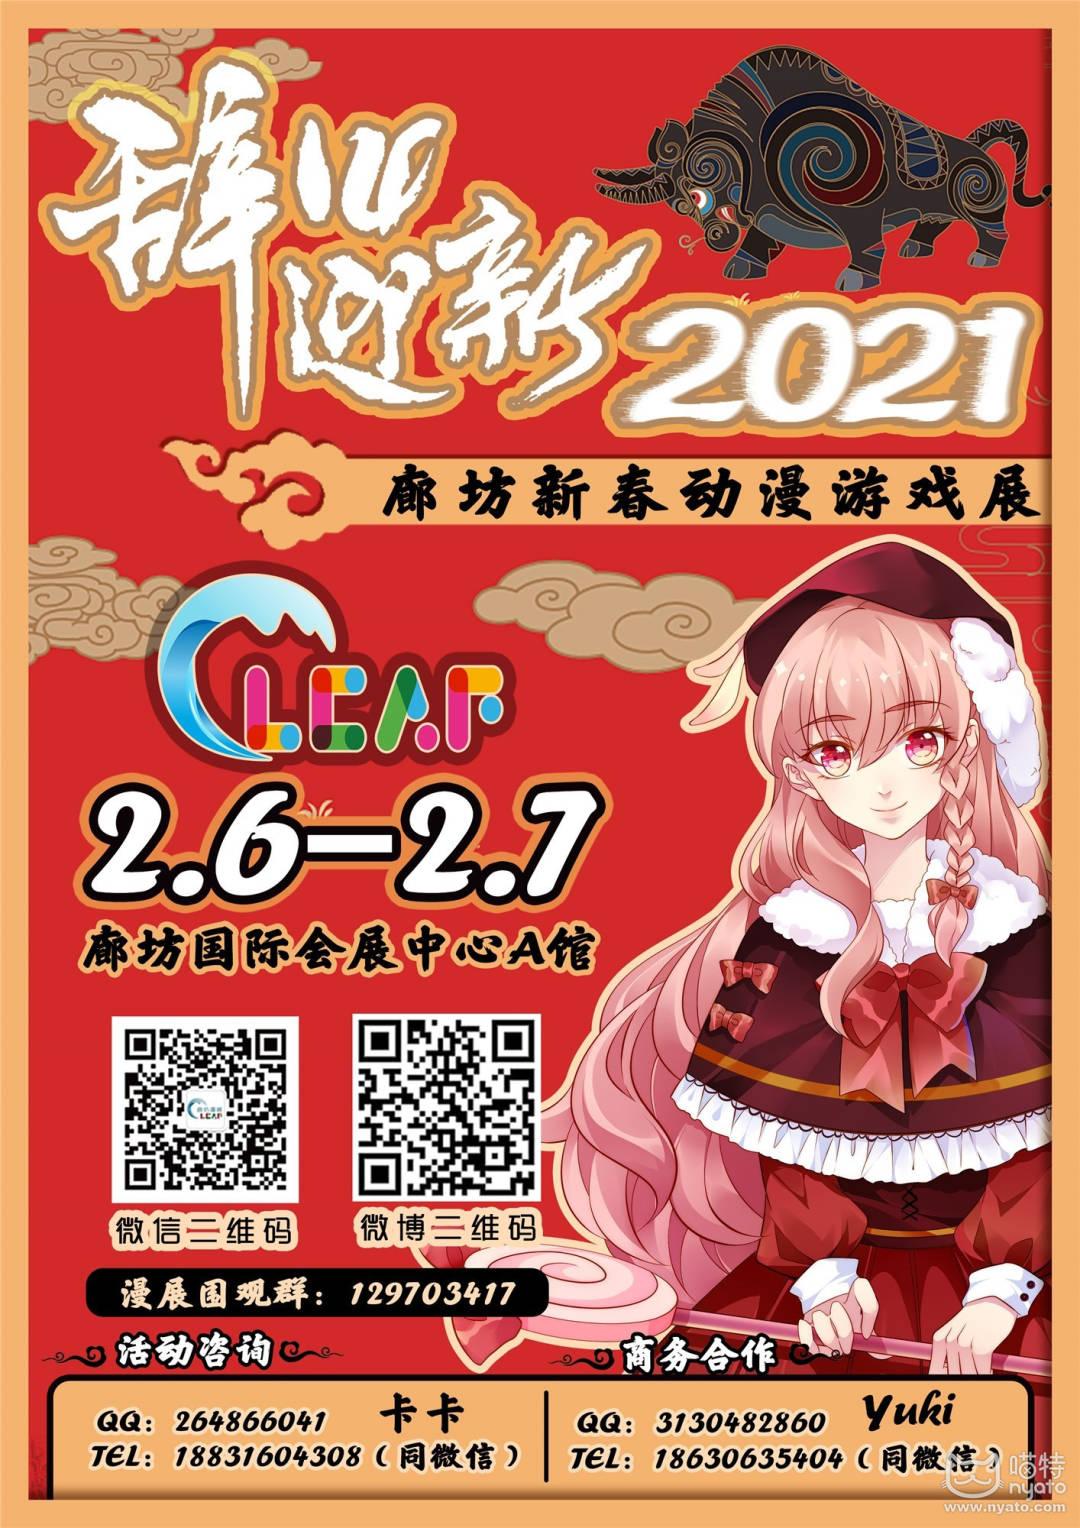 CLCAF·2021廊坊新春动漫游戏展-预告宣.jpg